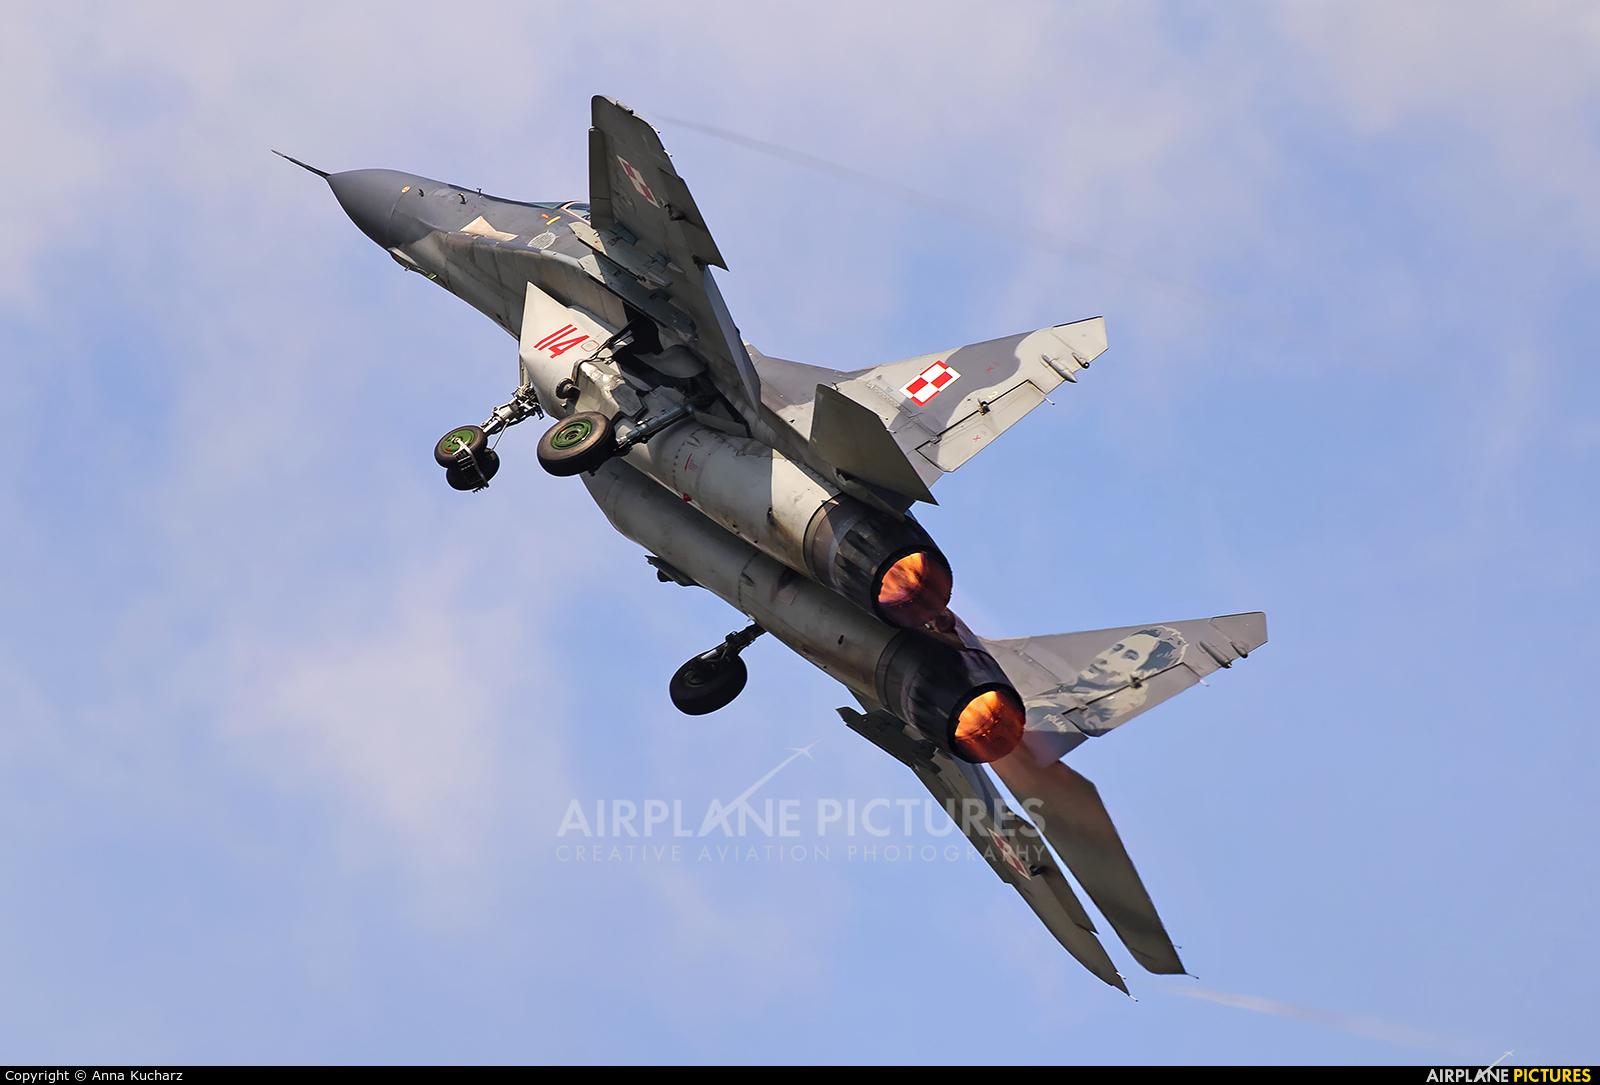 Poland - Air Force 114 aircraft at Mińsk Mazowiecki